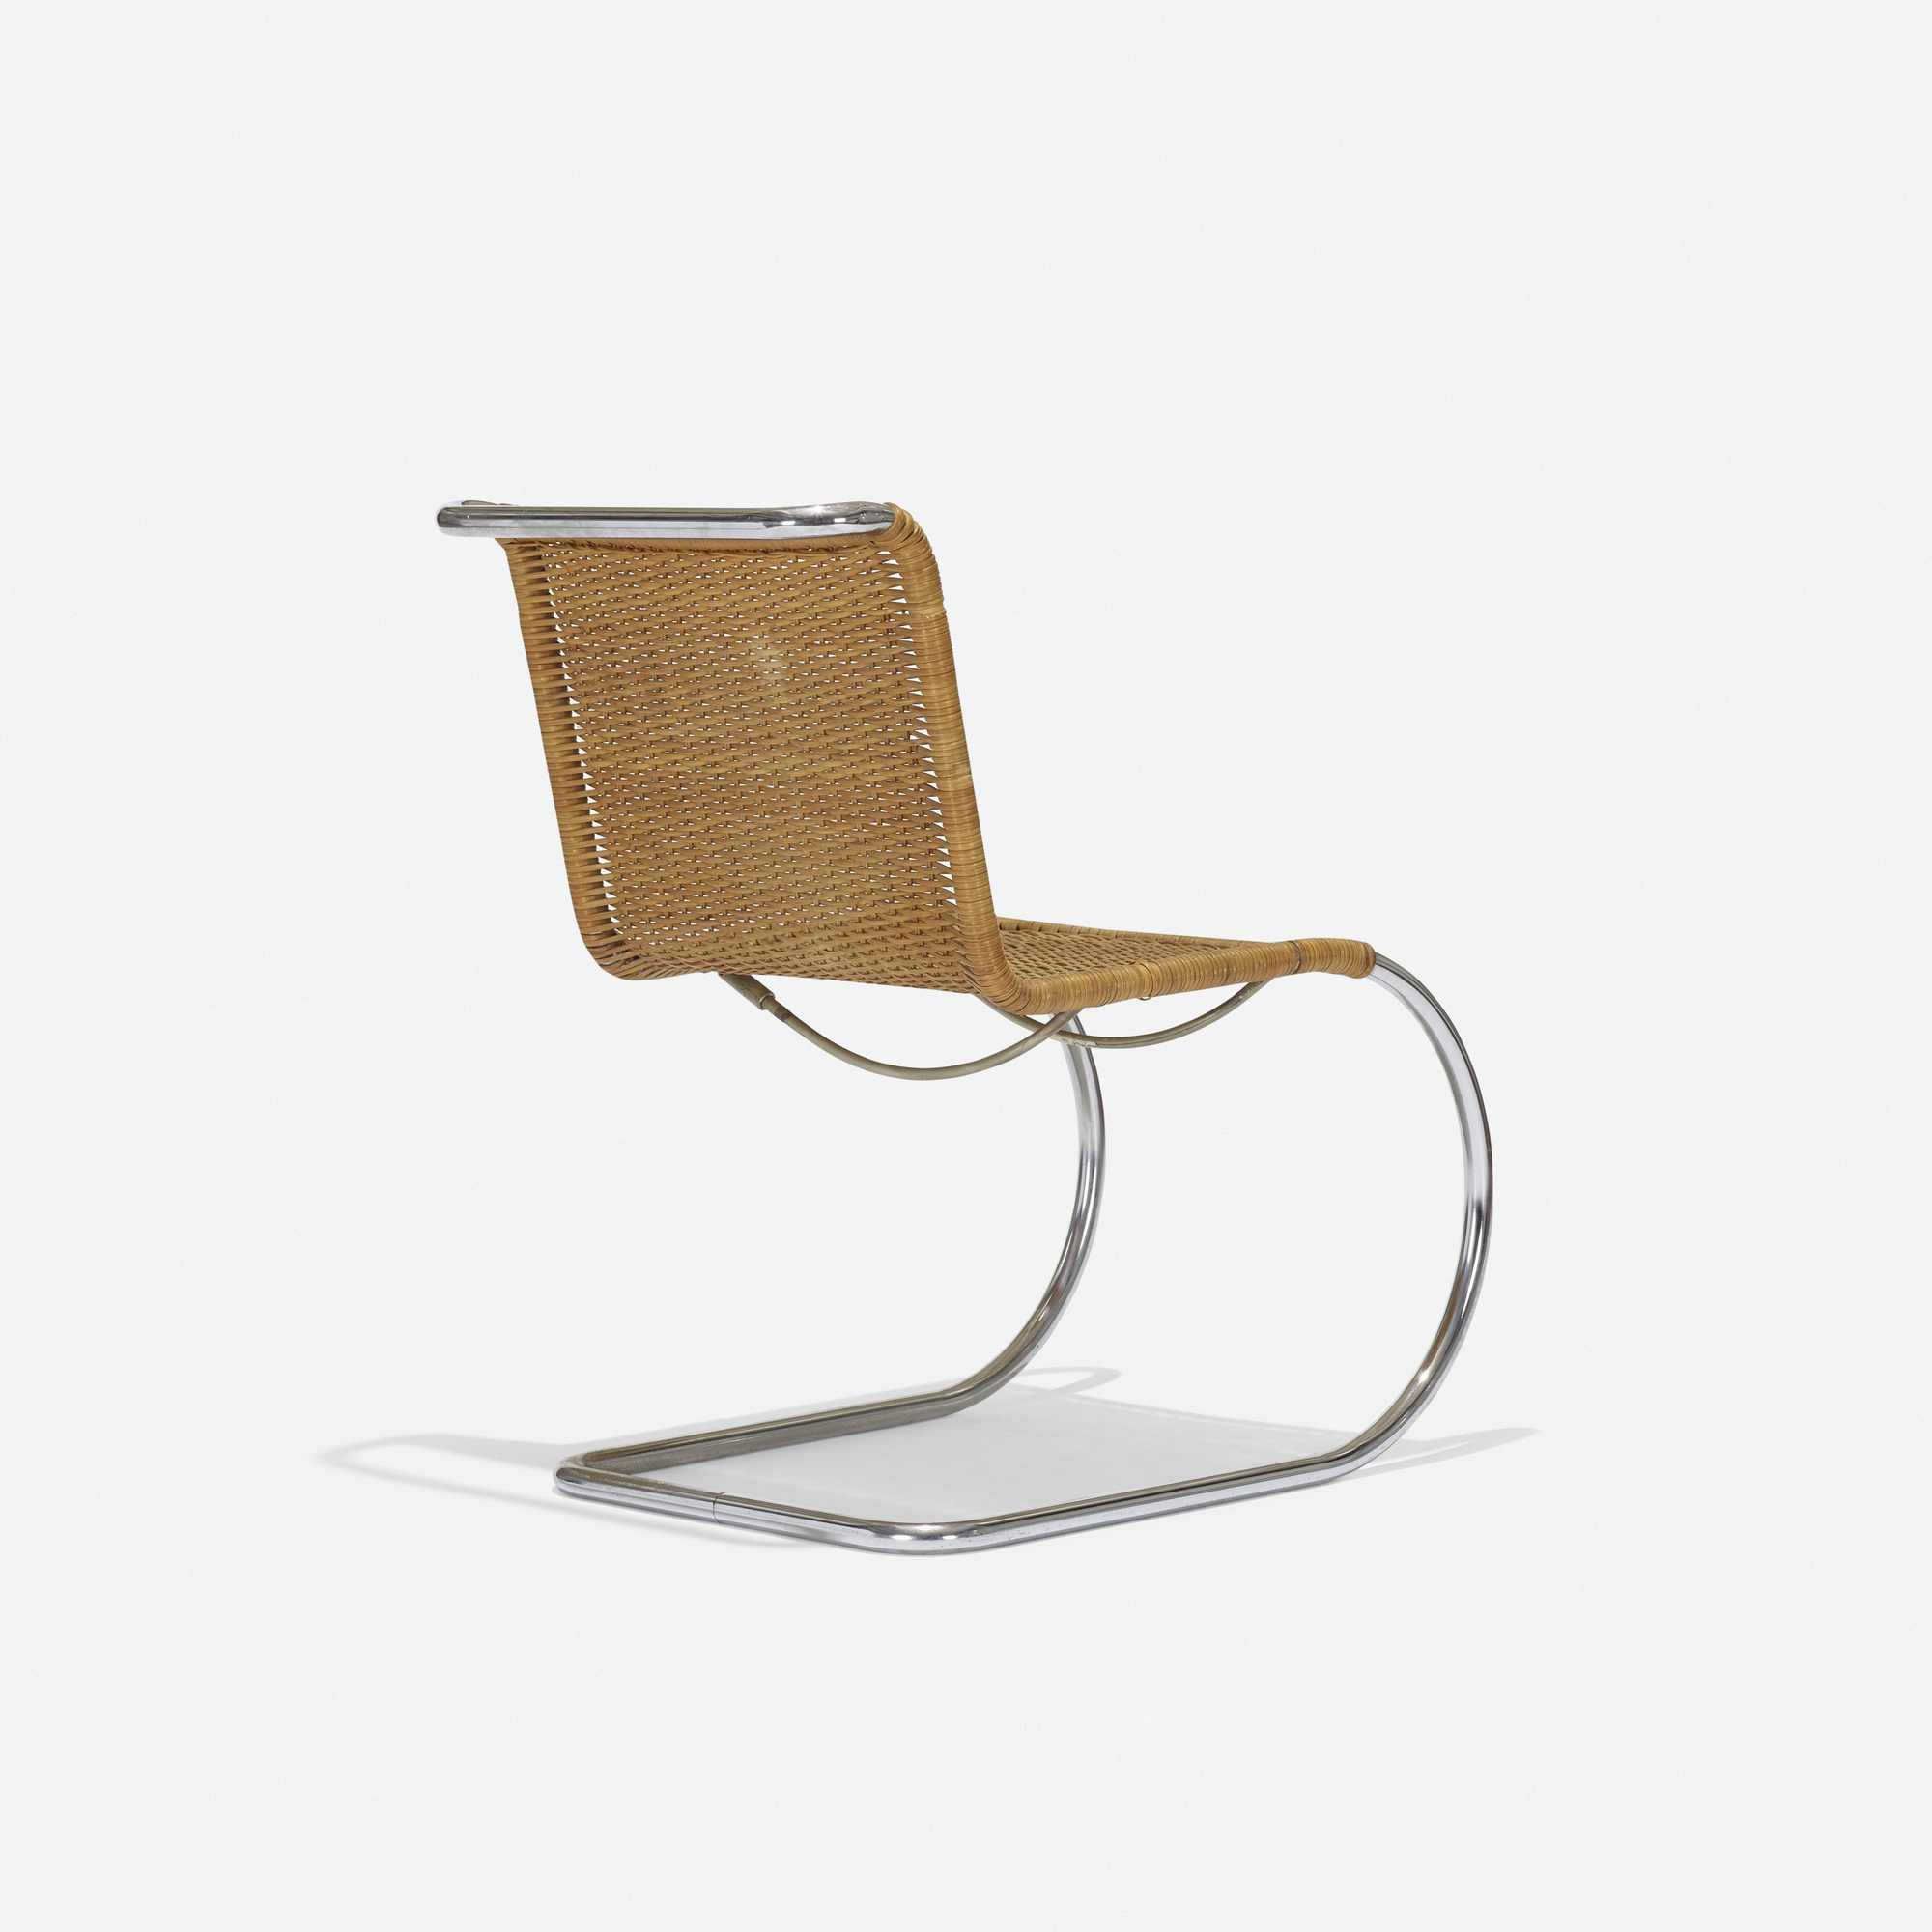 214: Ludwig Mies van der Rohe / MR10 chair (2 of 3)